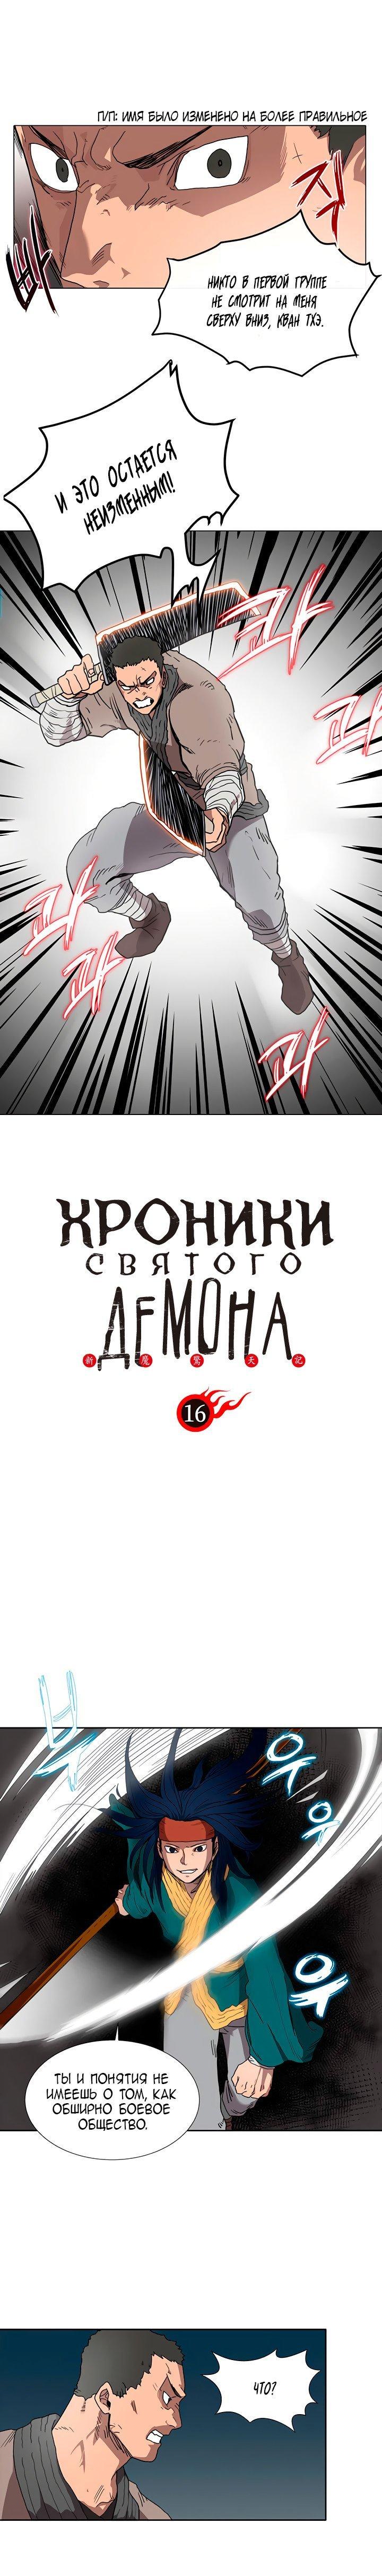 Манга Хроники Святого Демона - Глава 16 Страница 1